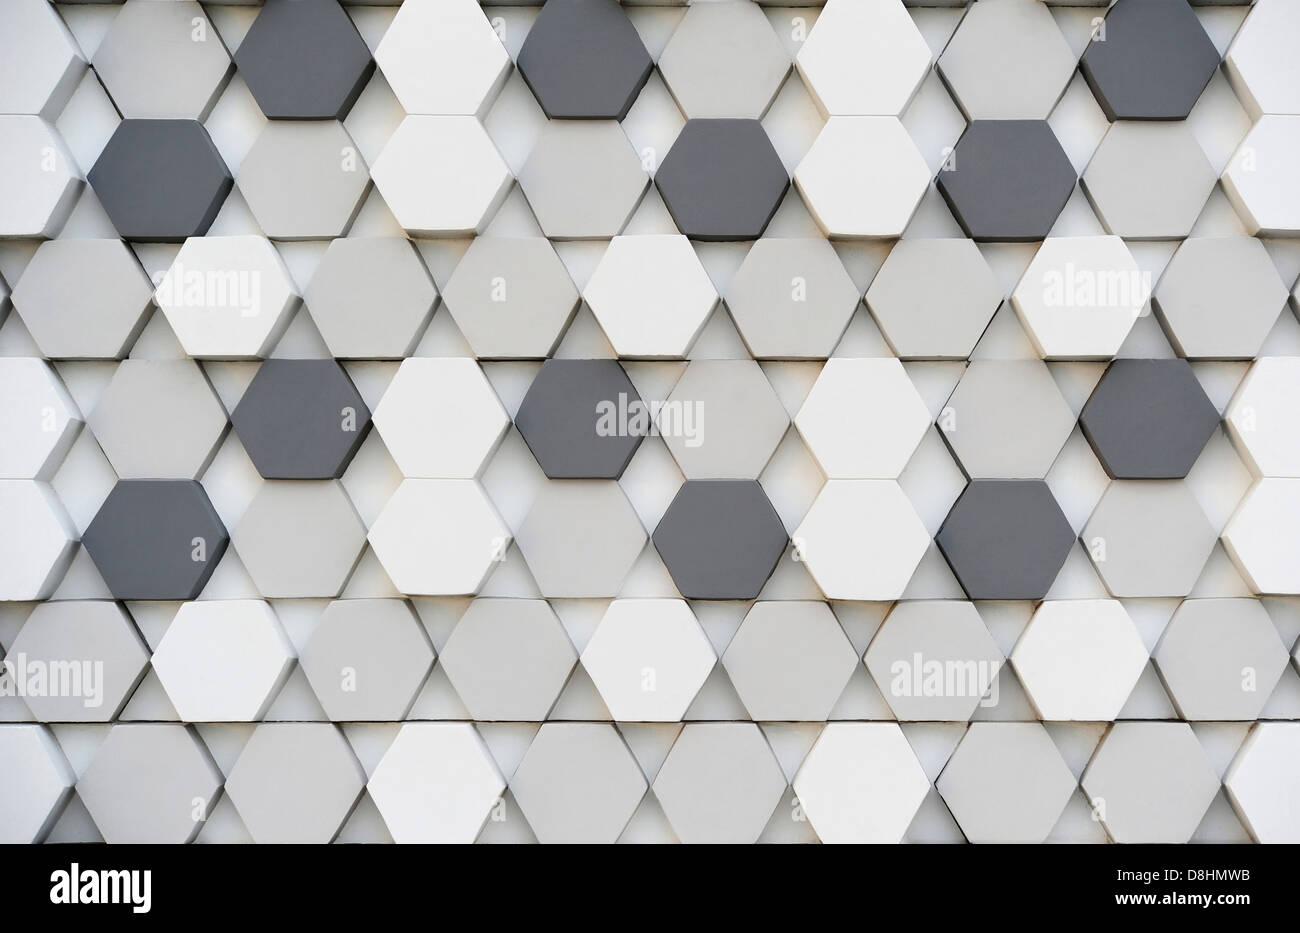 Hexagon pattern - Stock Image